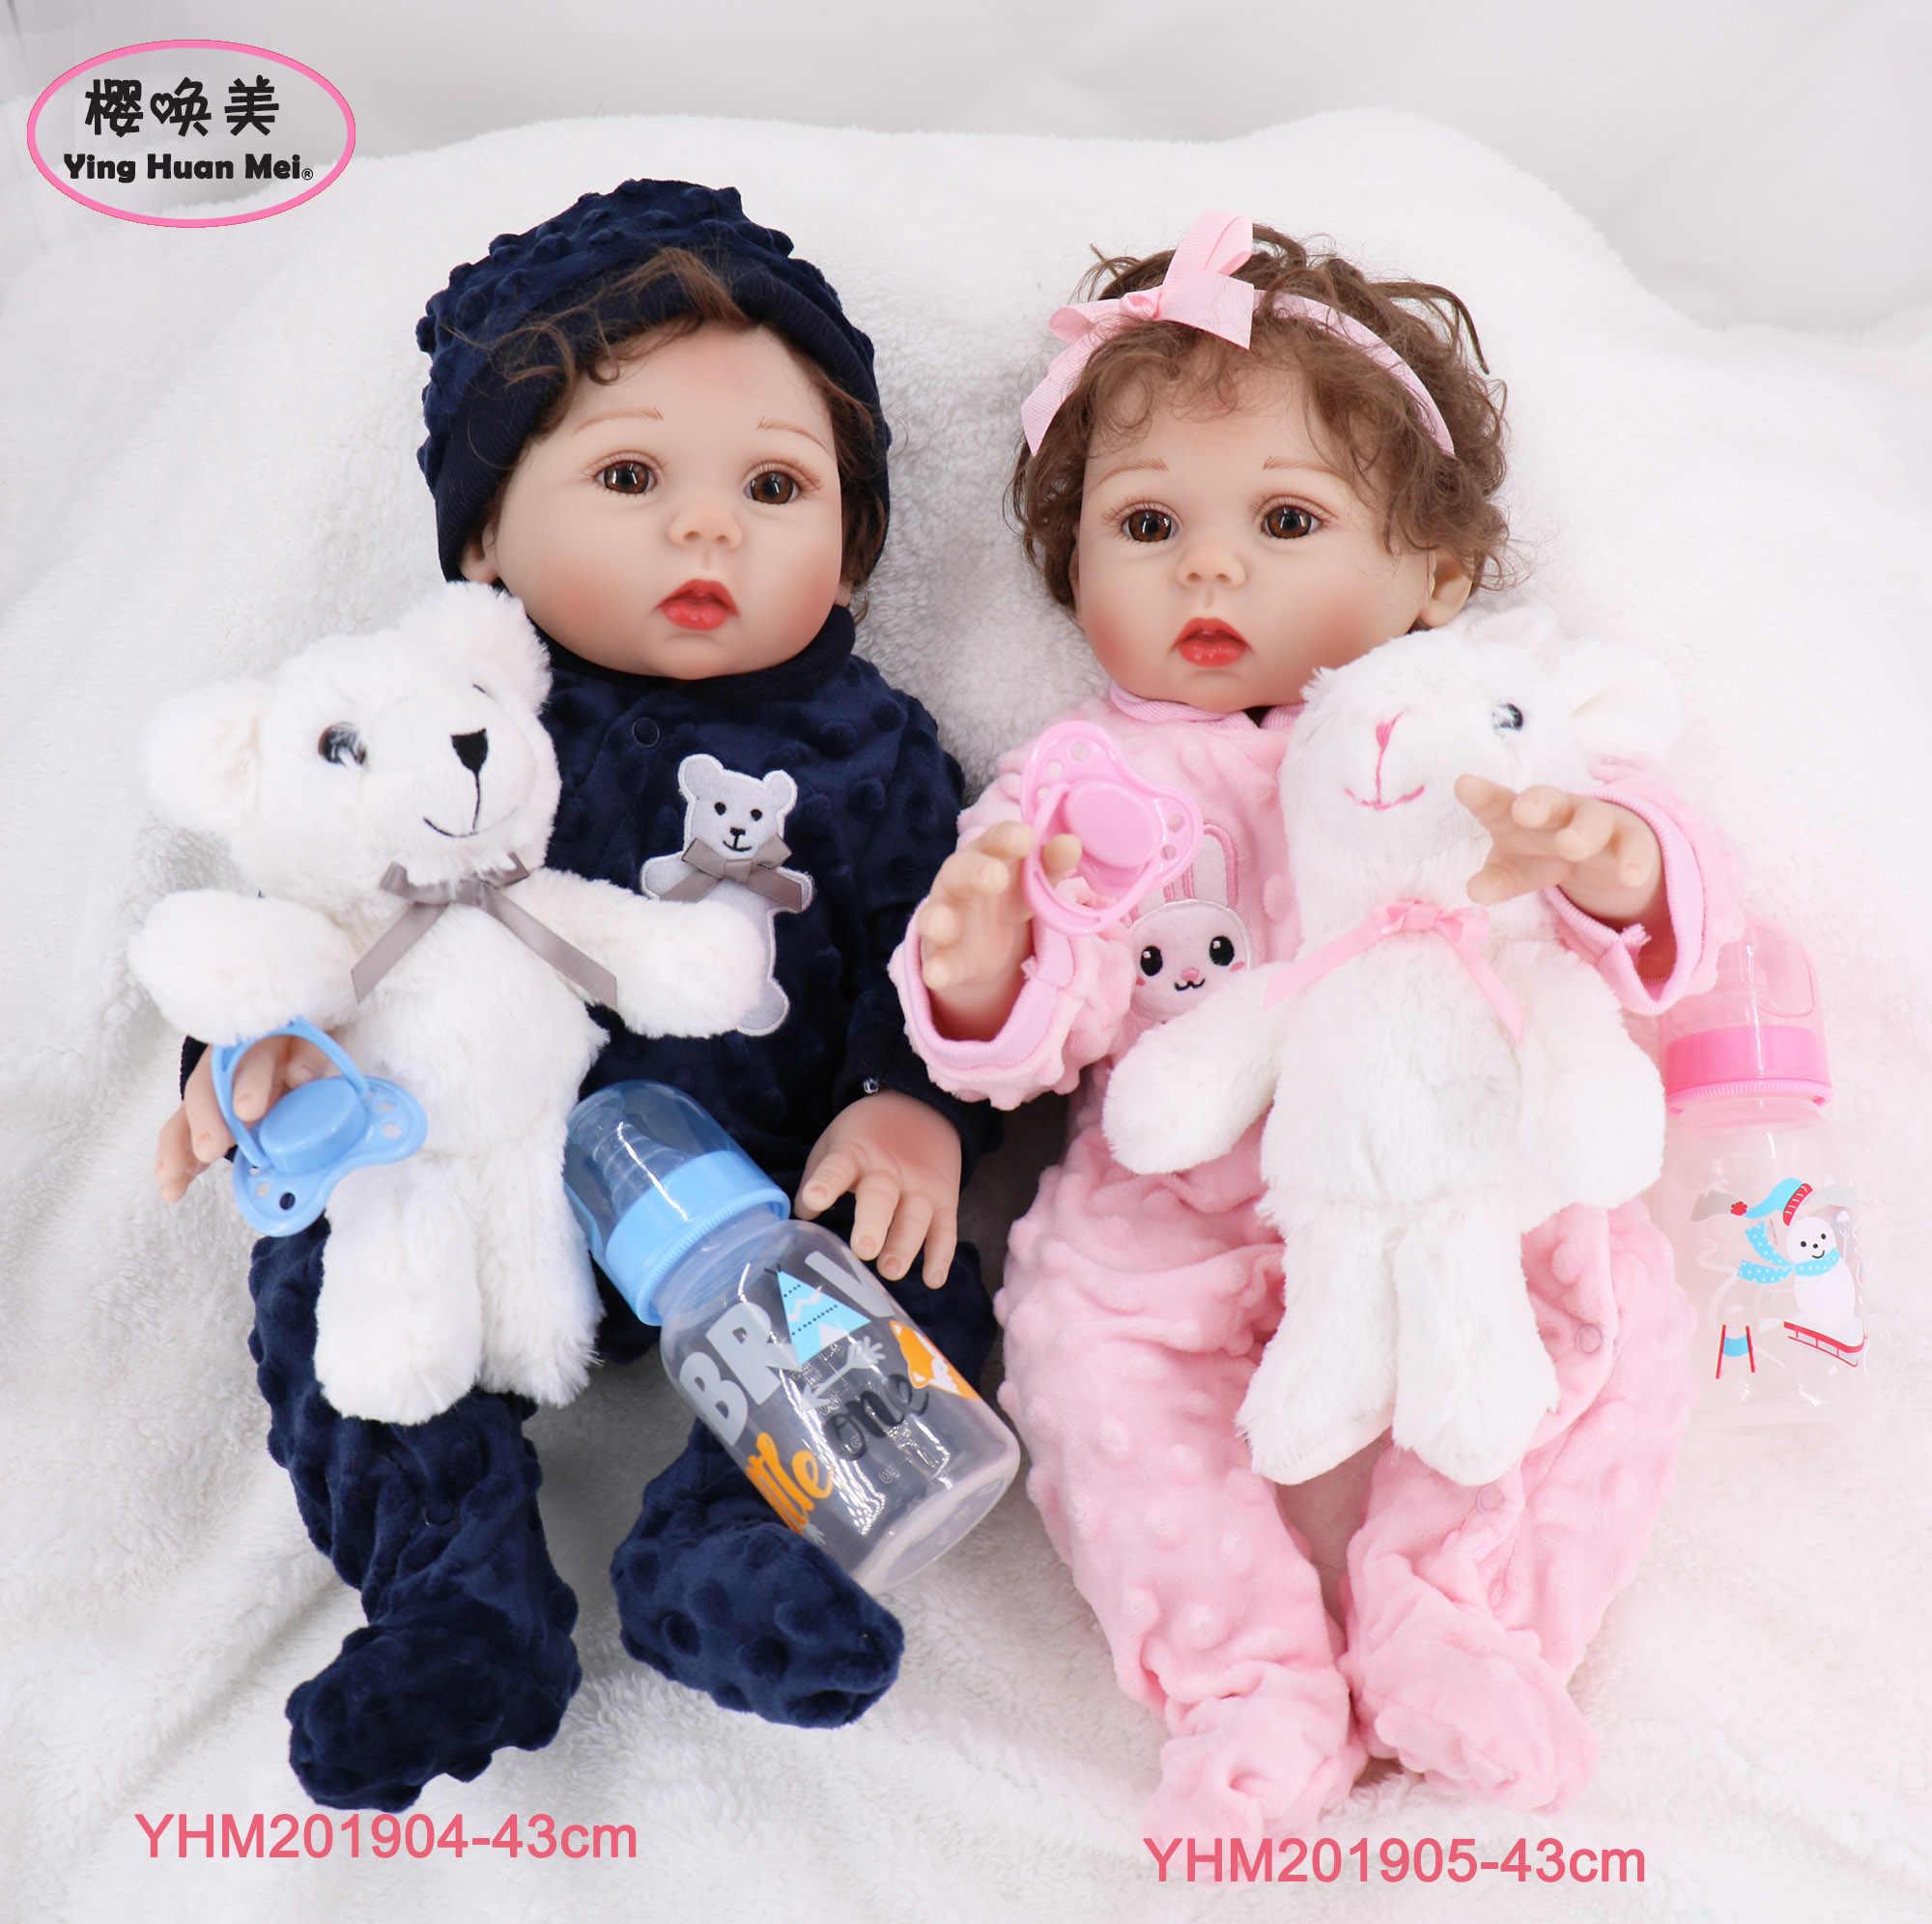 Criança renascer silicone completo reborn corpo do bebê bonecas menino menina gêmeo 43 cm vinil realista mini moll banho brinquedo à prova dwaterproof água